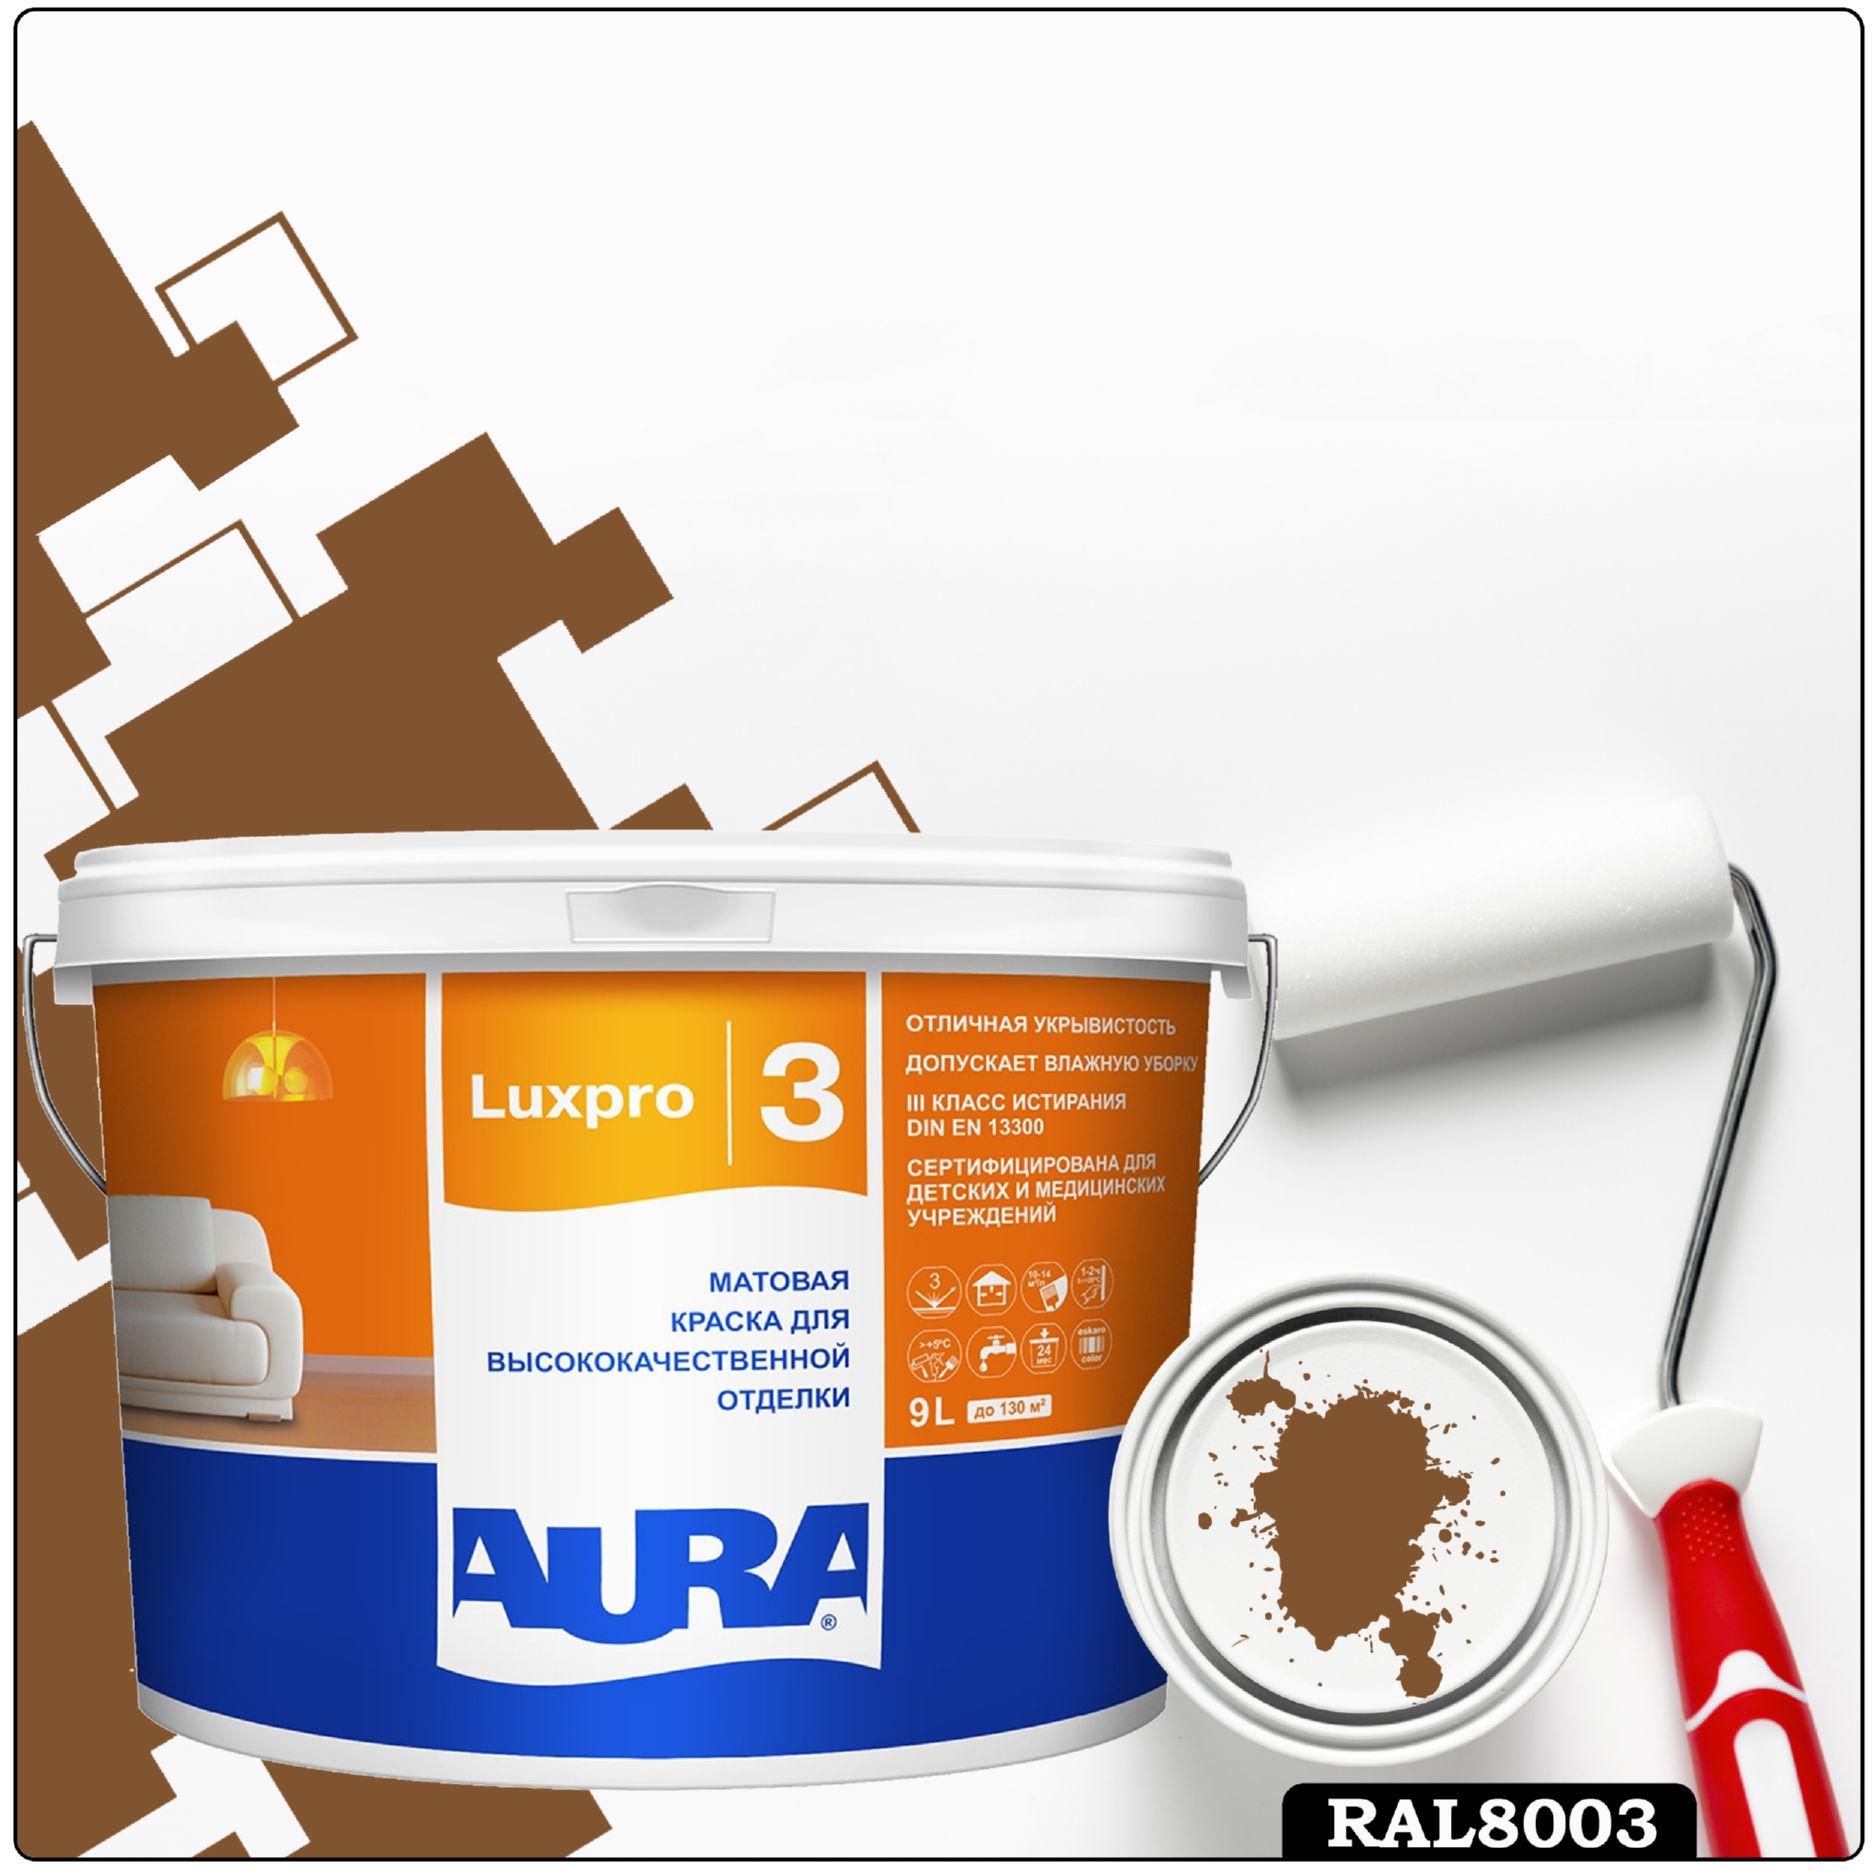 Фото 4 - Краска Aura LuxPRO 3, RAL 8003 Коричневая глина, латексная, шелково-матовая, интерьерная, 9л, Аура.